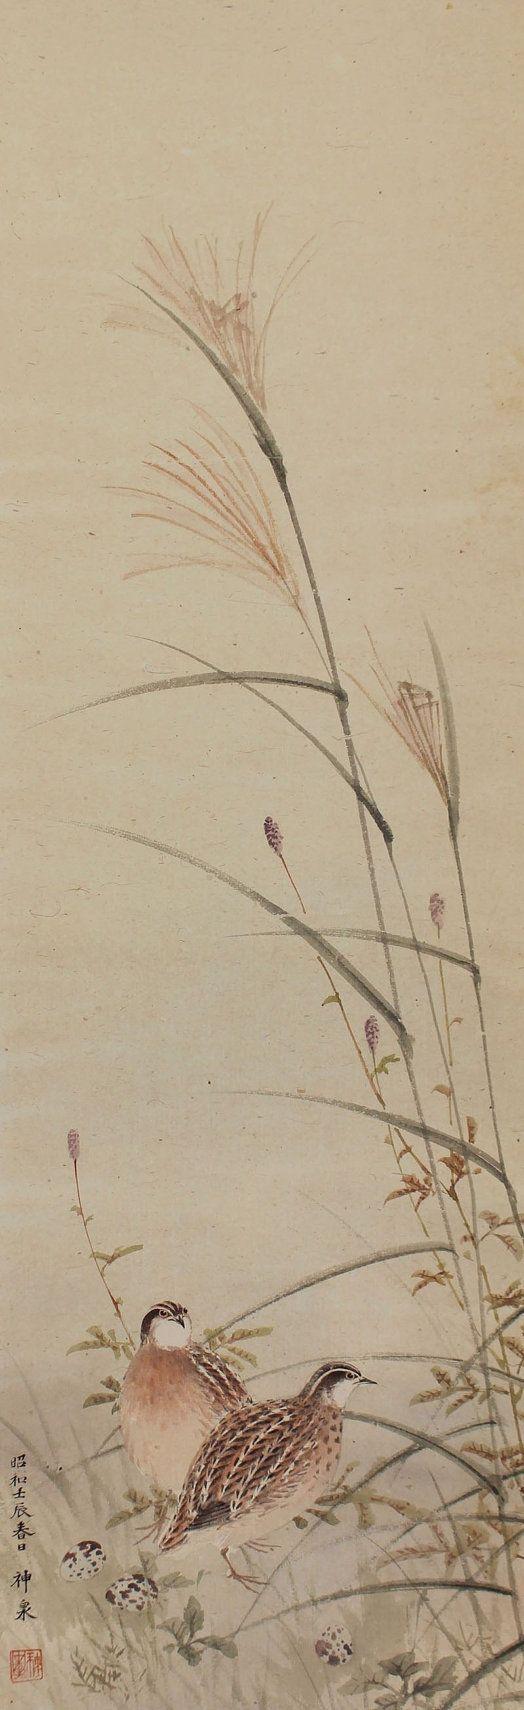 Antique Japanese Fine Art Wall Hanging Scroll Painting Bird and Flower Quail in the Japanese Pampas Grass Kakejiku – 1510059